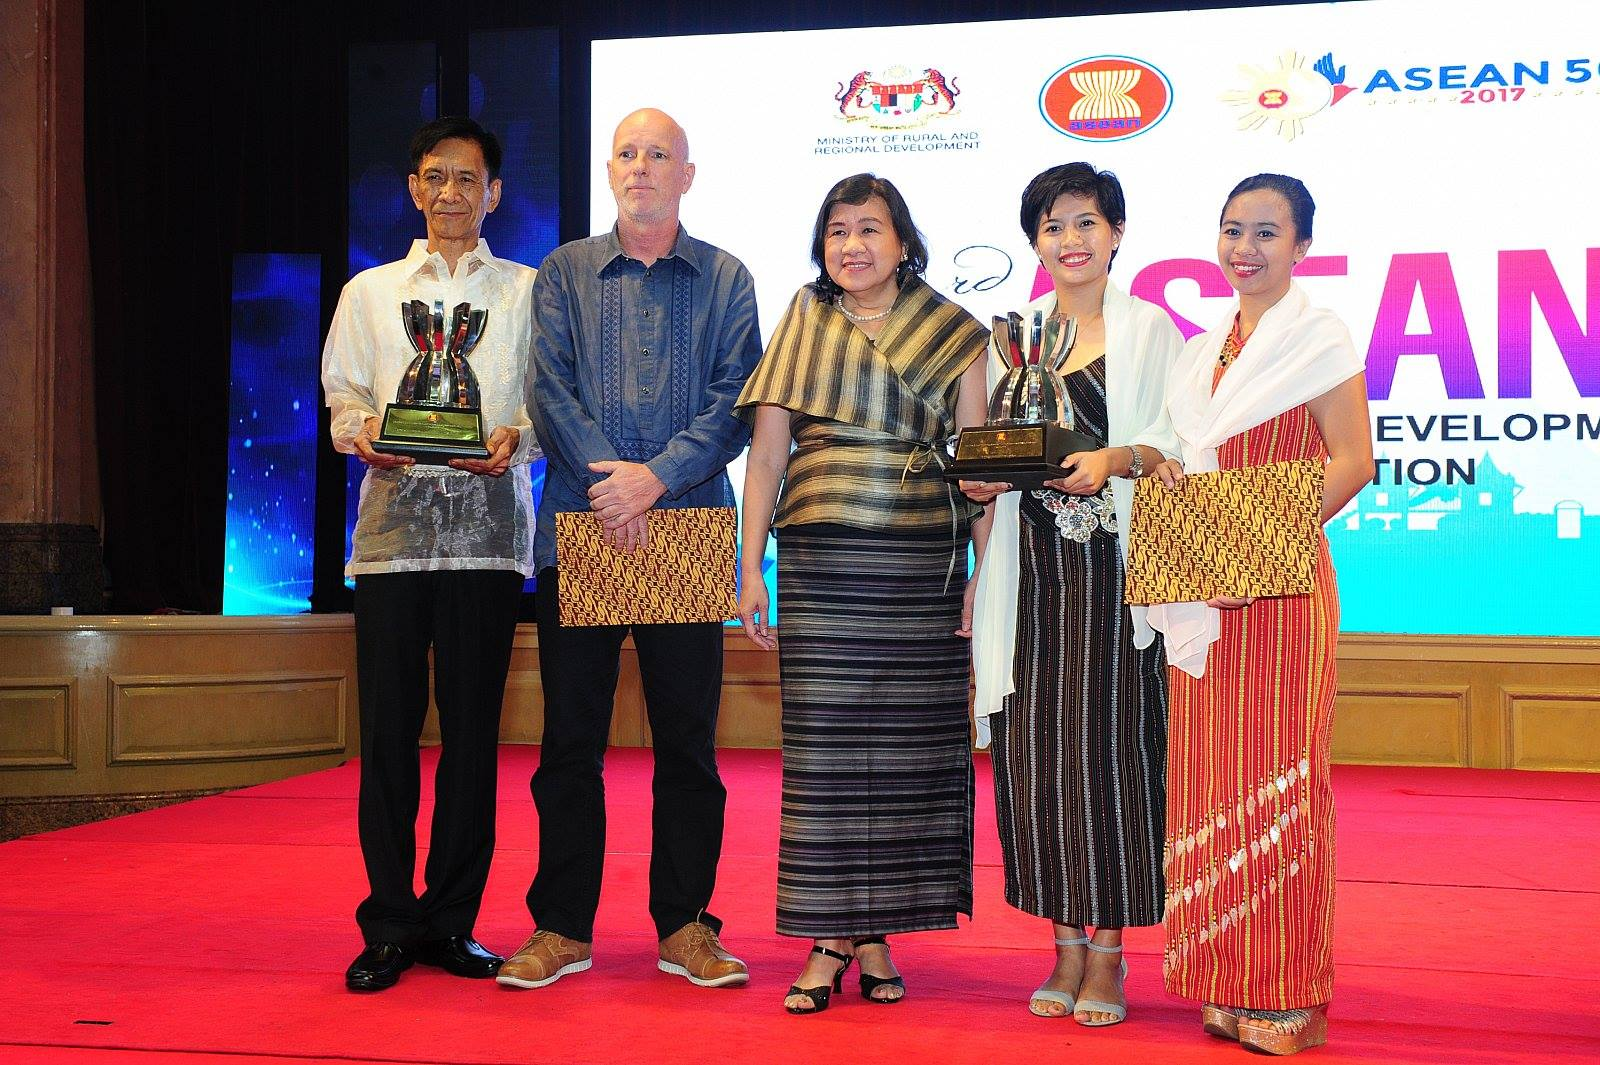 AIDFI - 3rd ASEAN Leadership Award on Rural Development and Poverty Eradication